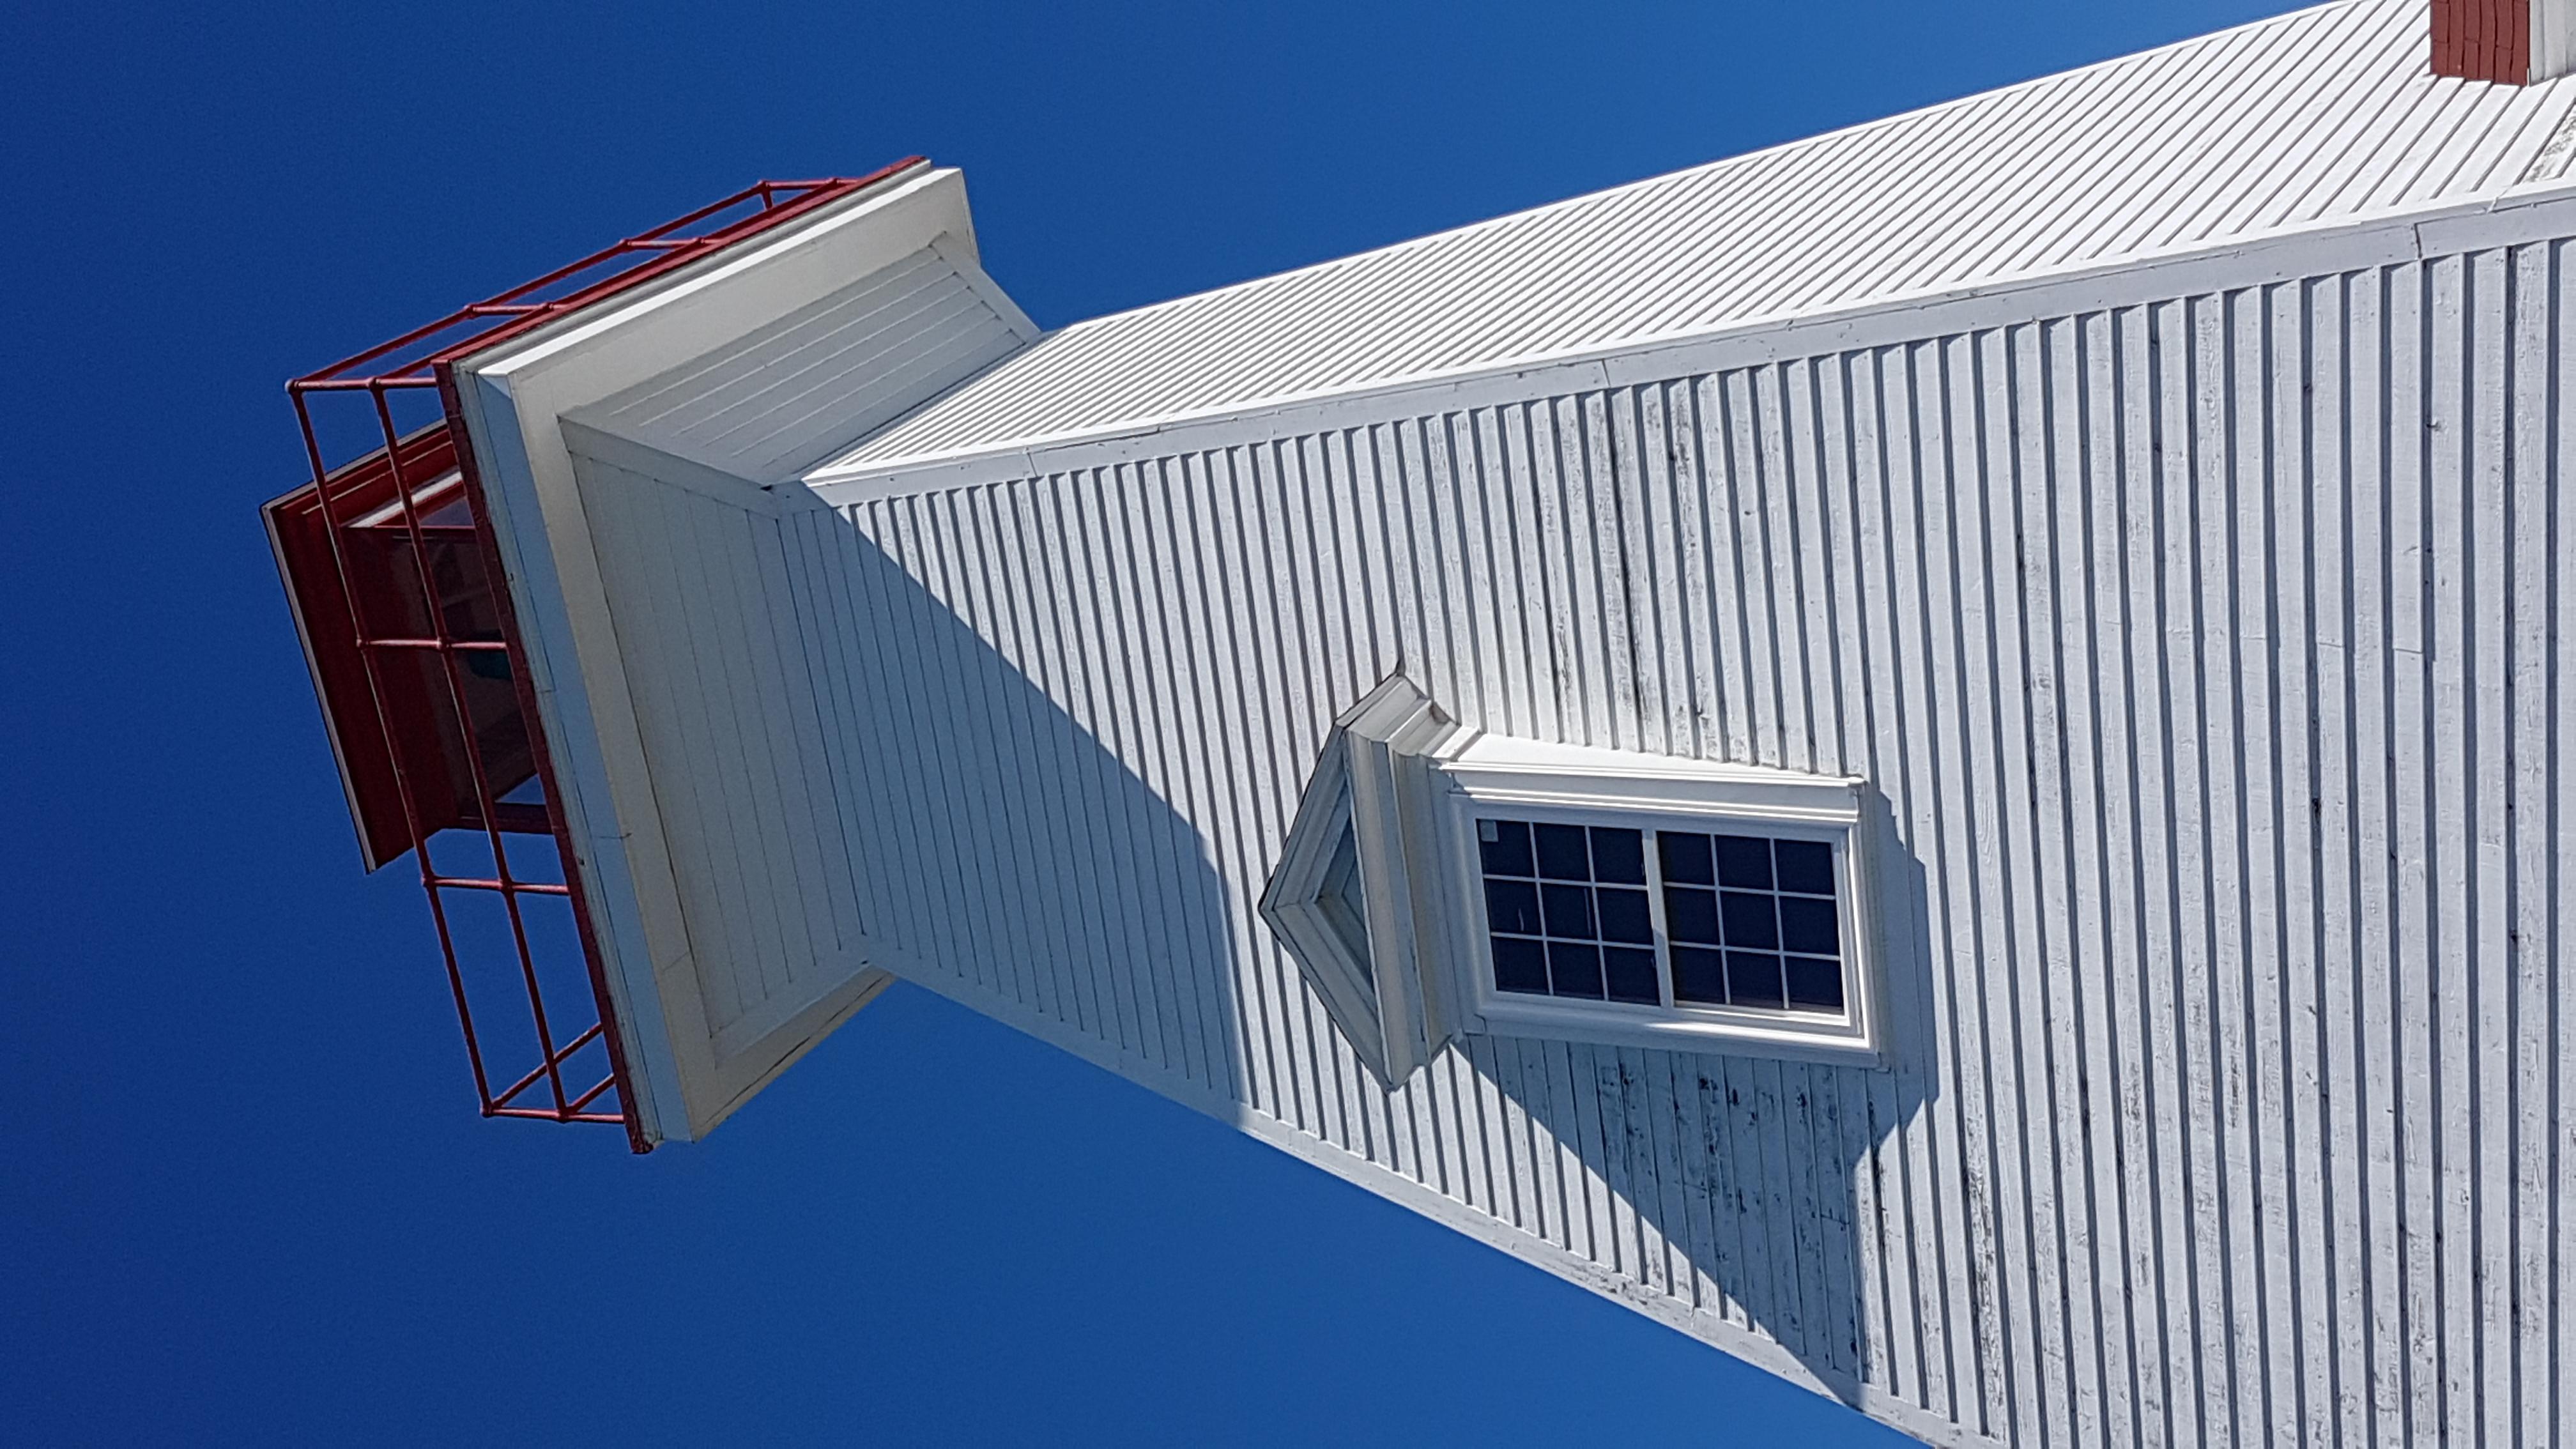 Mabou Lighthouse